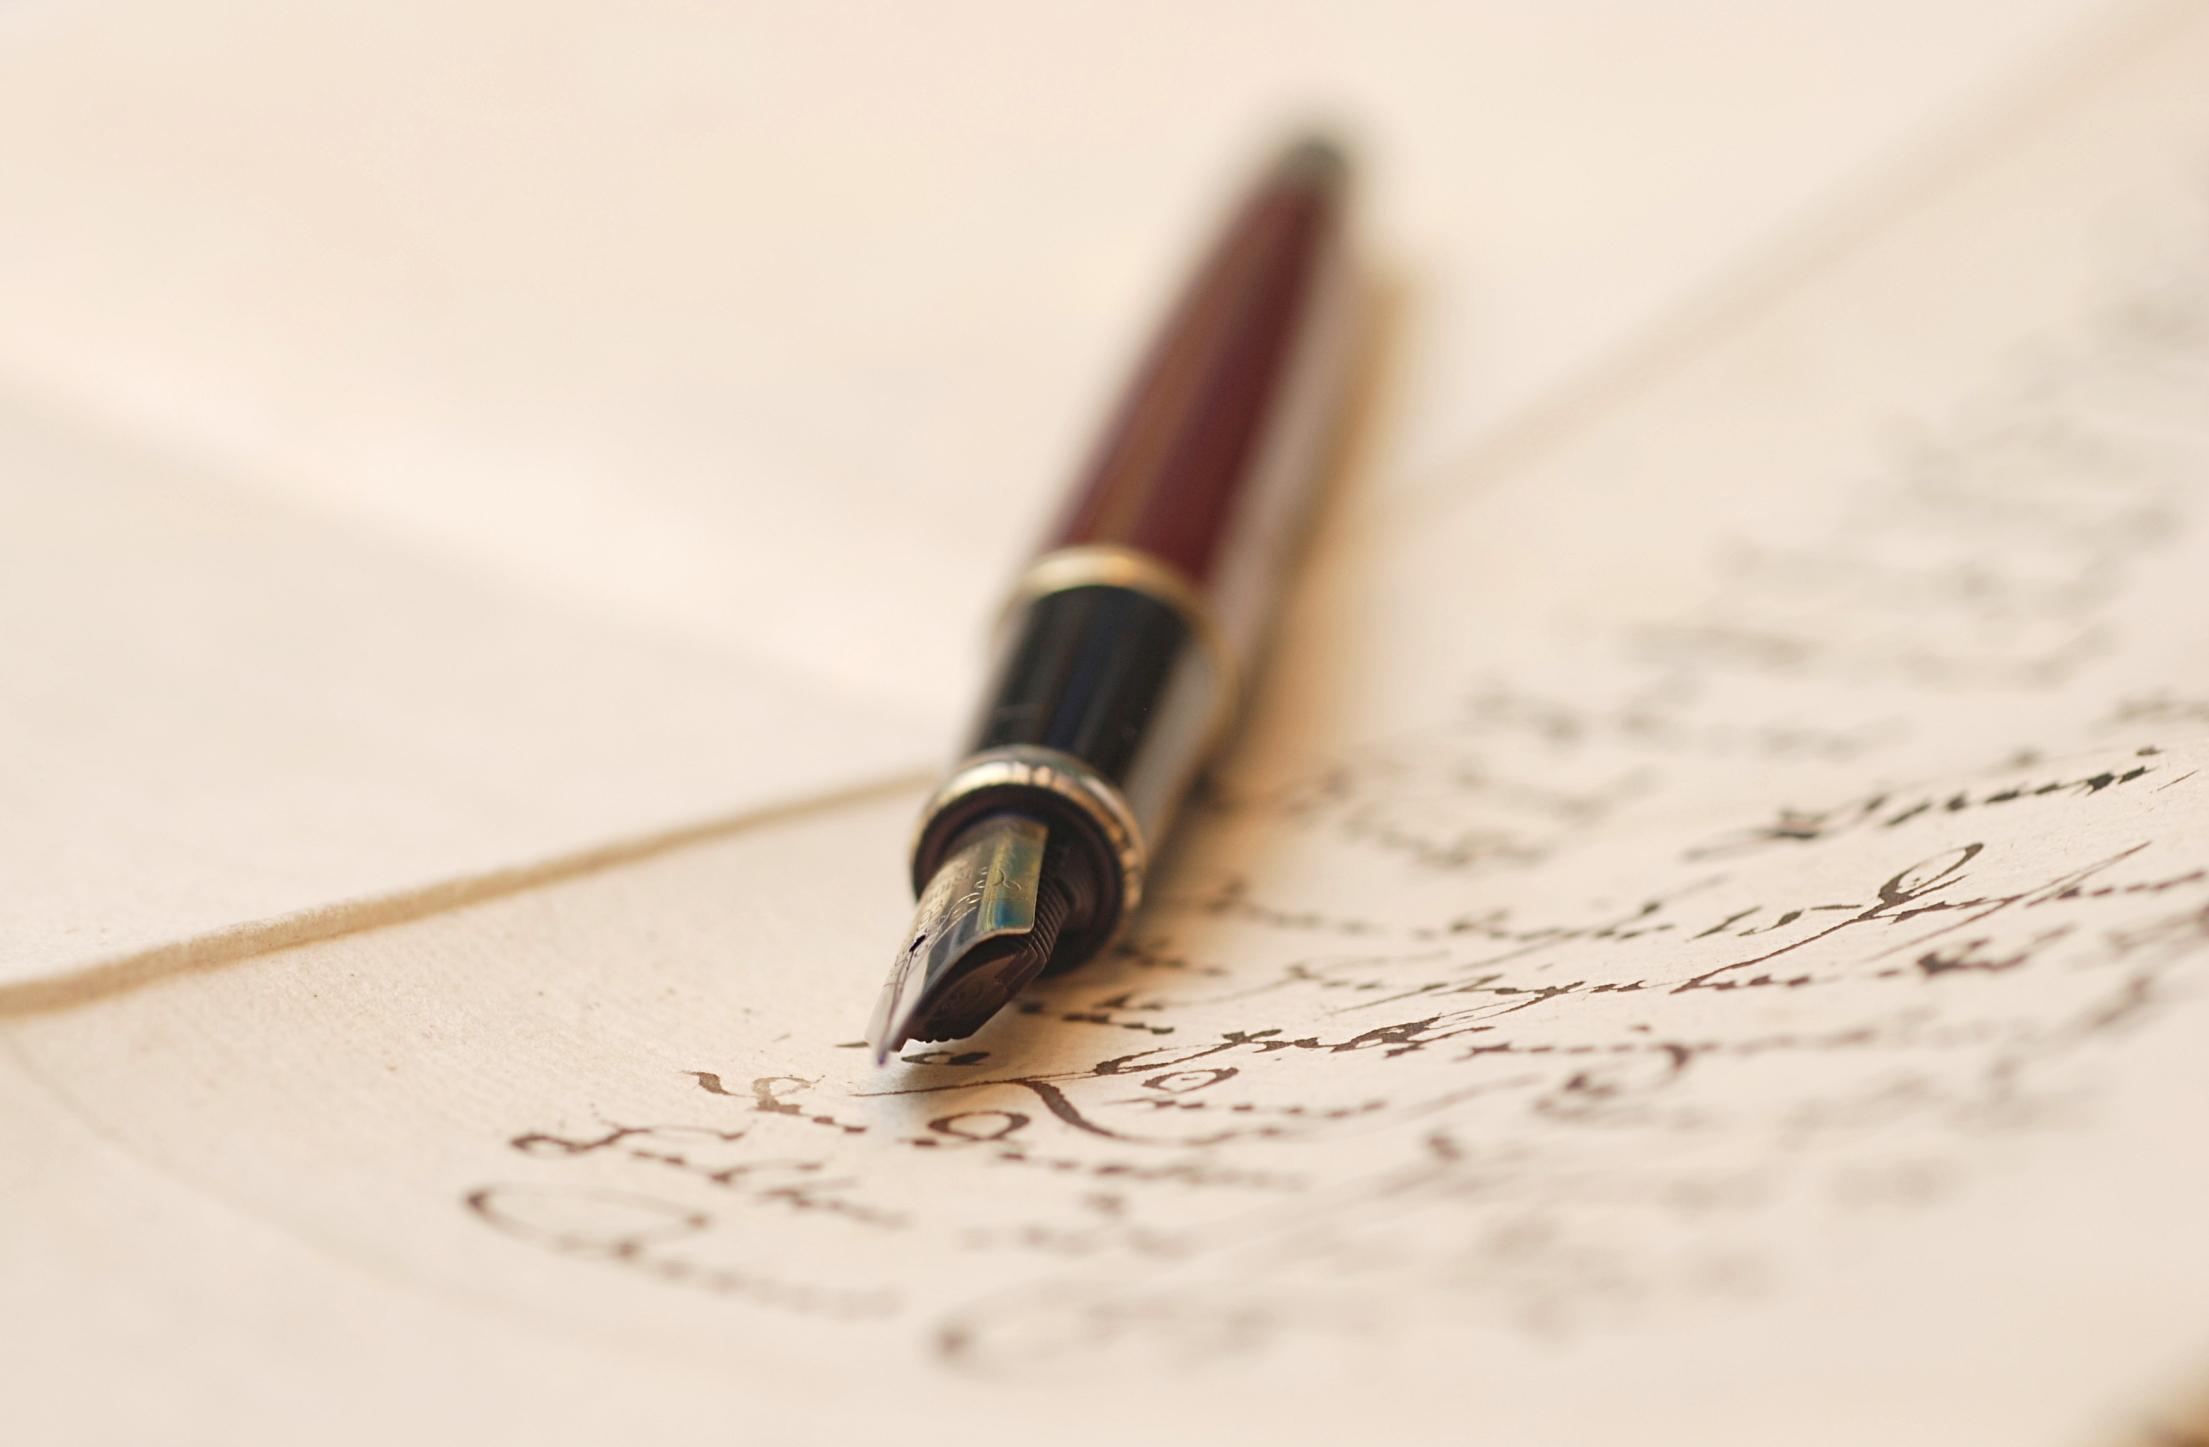 How to write a legal essay